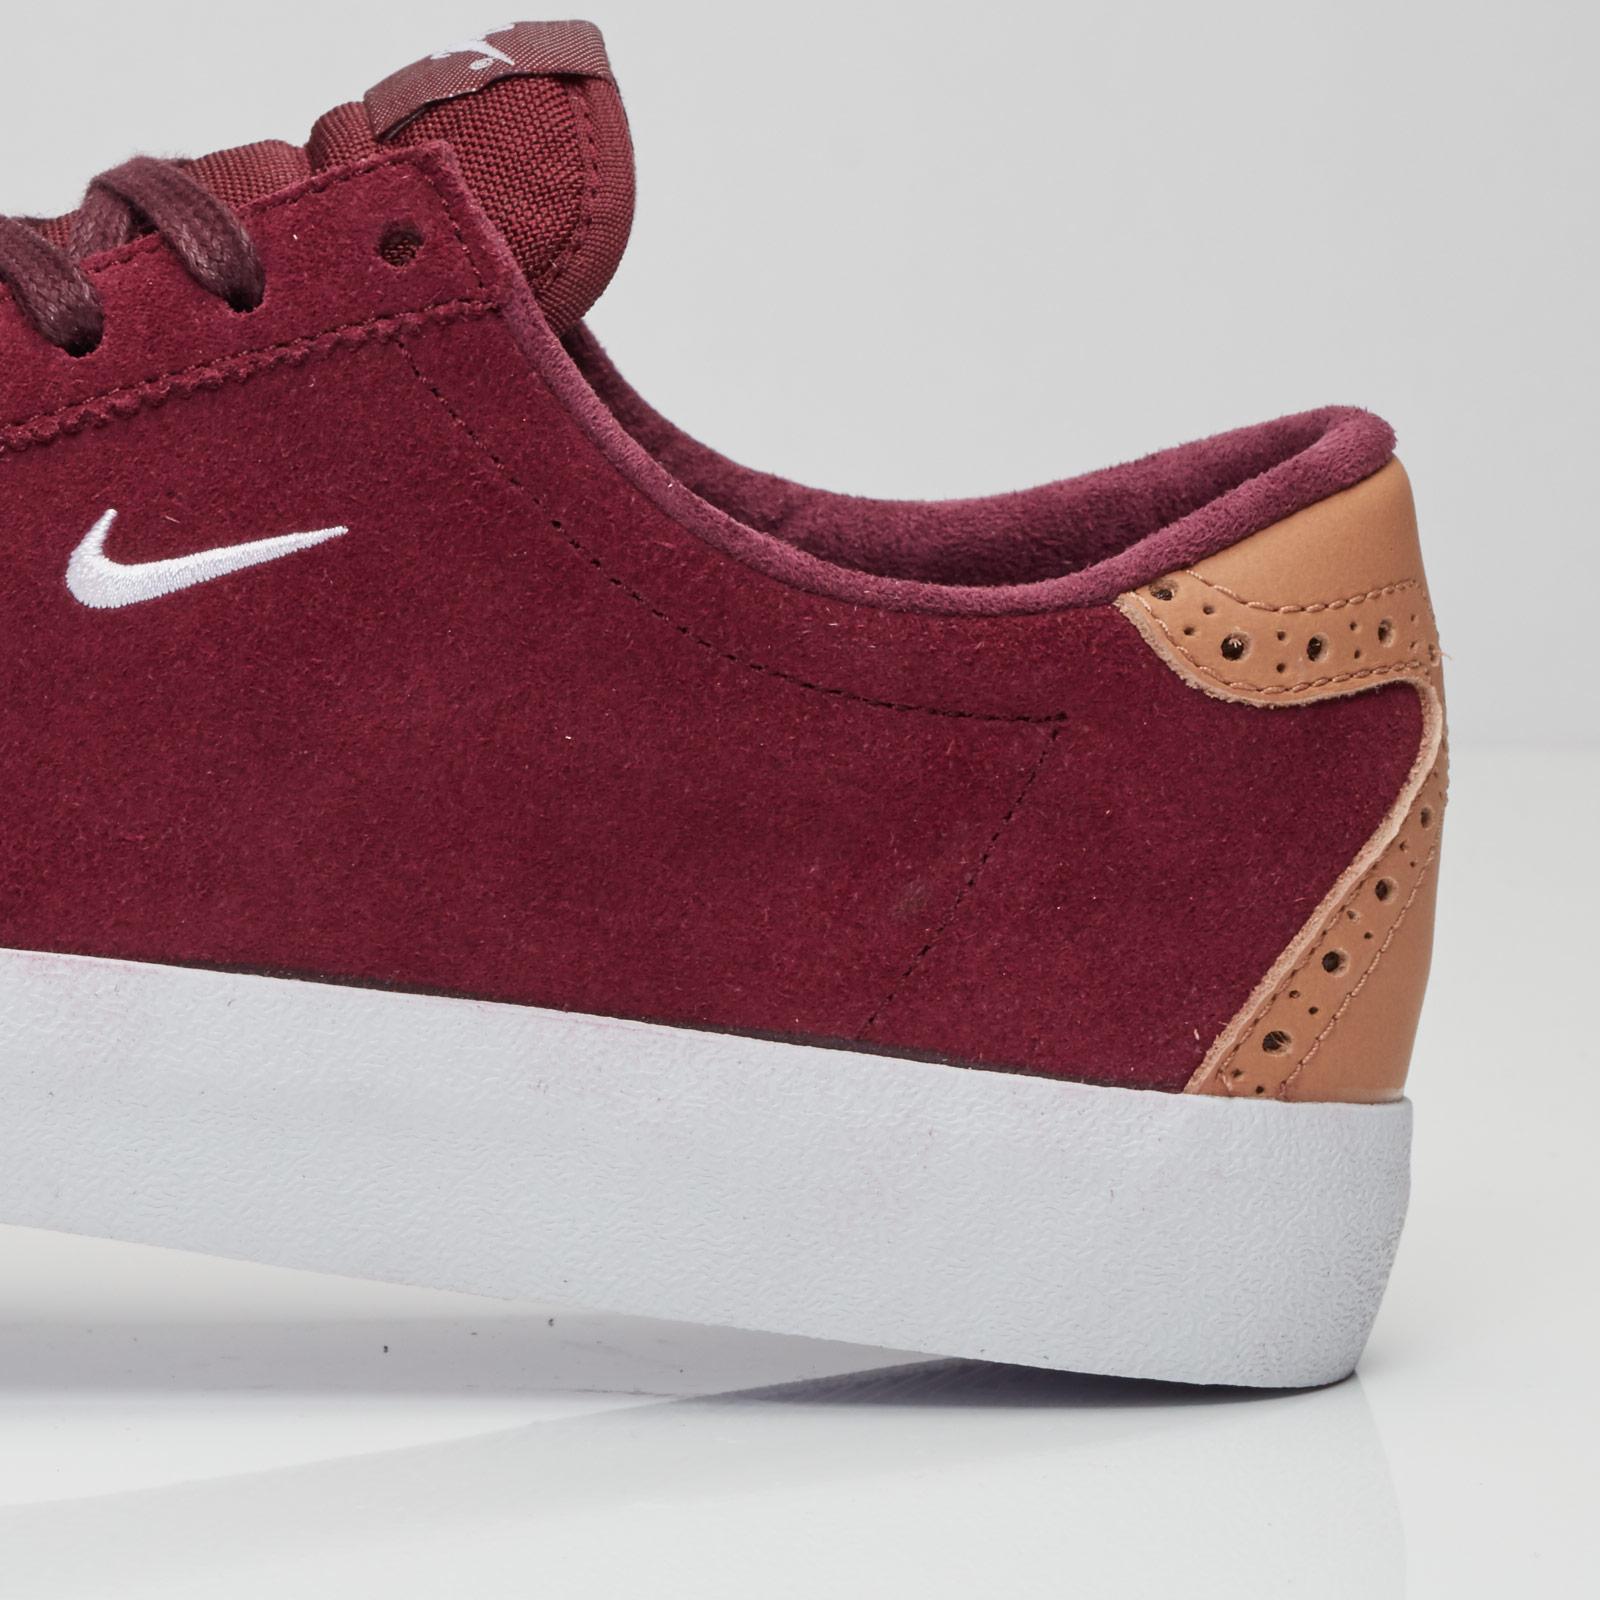 Nike Match Classic Suede - 844611-601 - Sneakersnstuff  95954ee3e42c